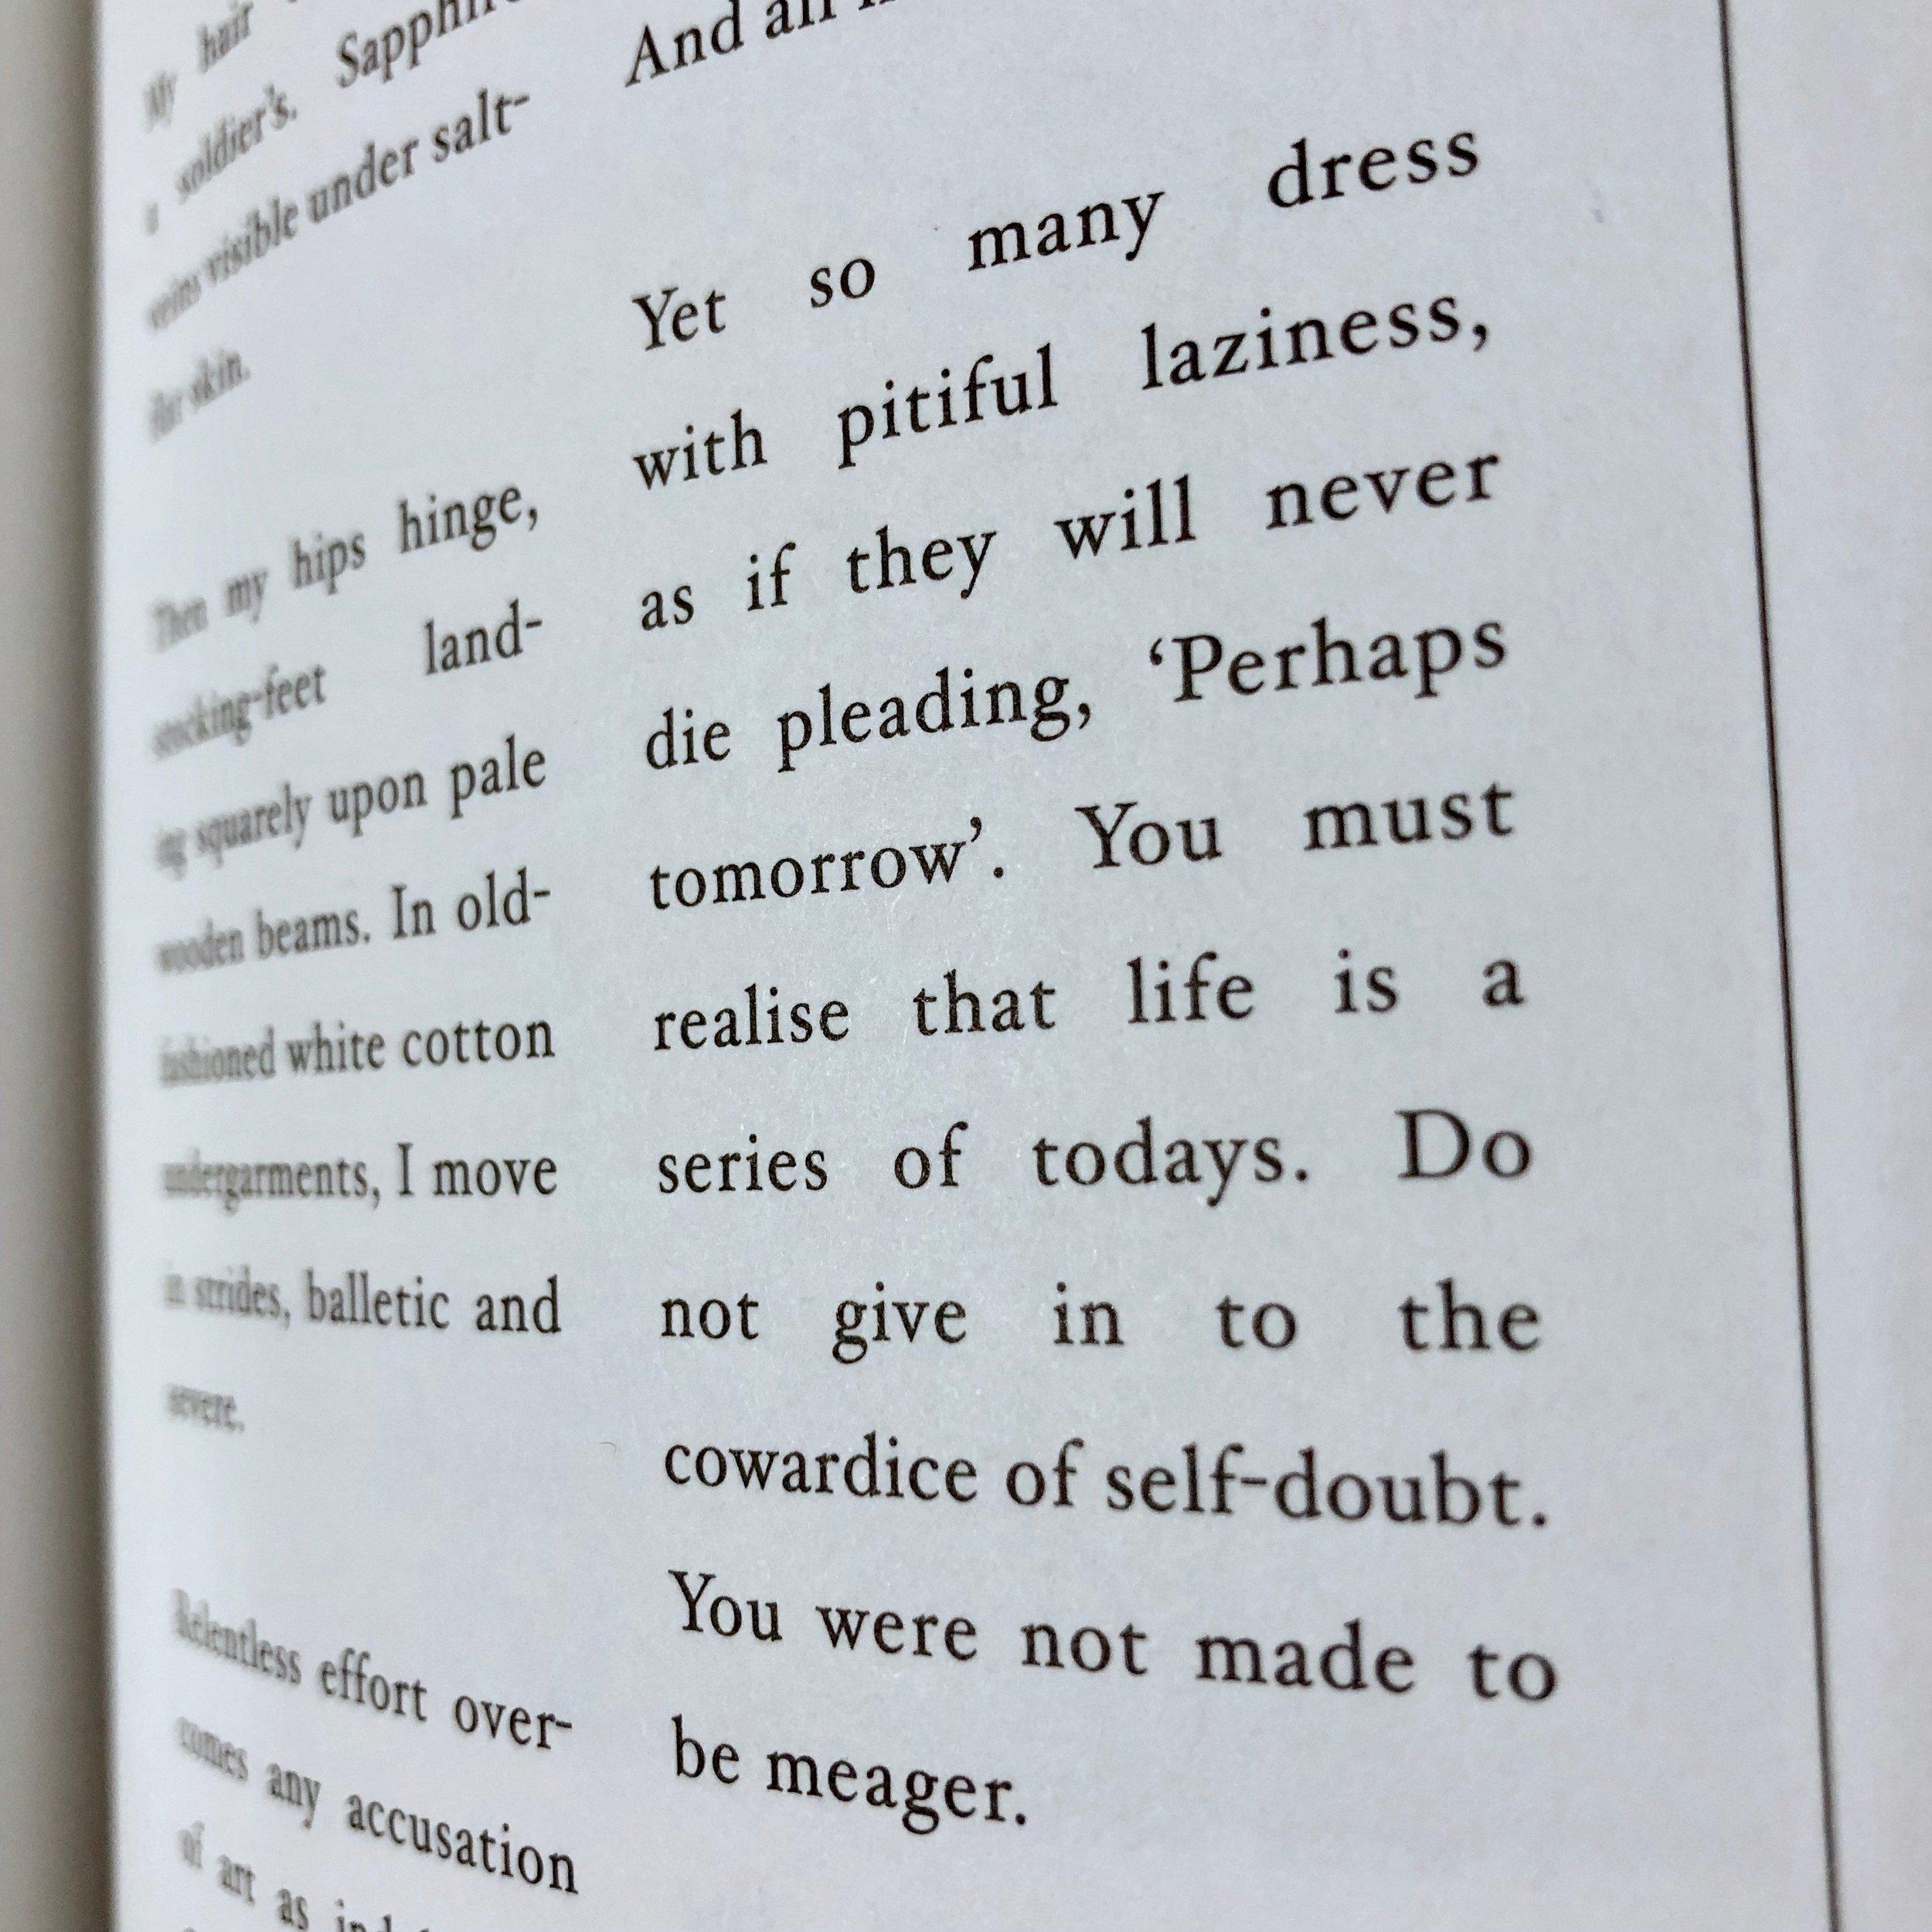 Perhaps Tomorrow.